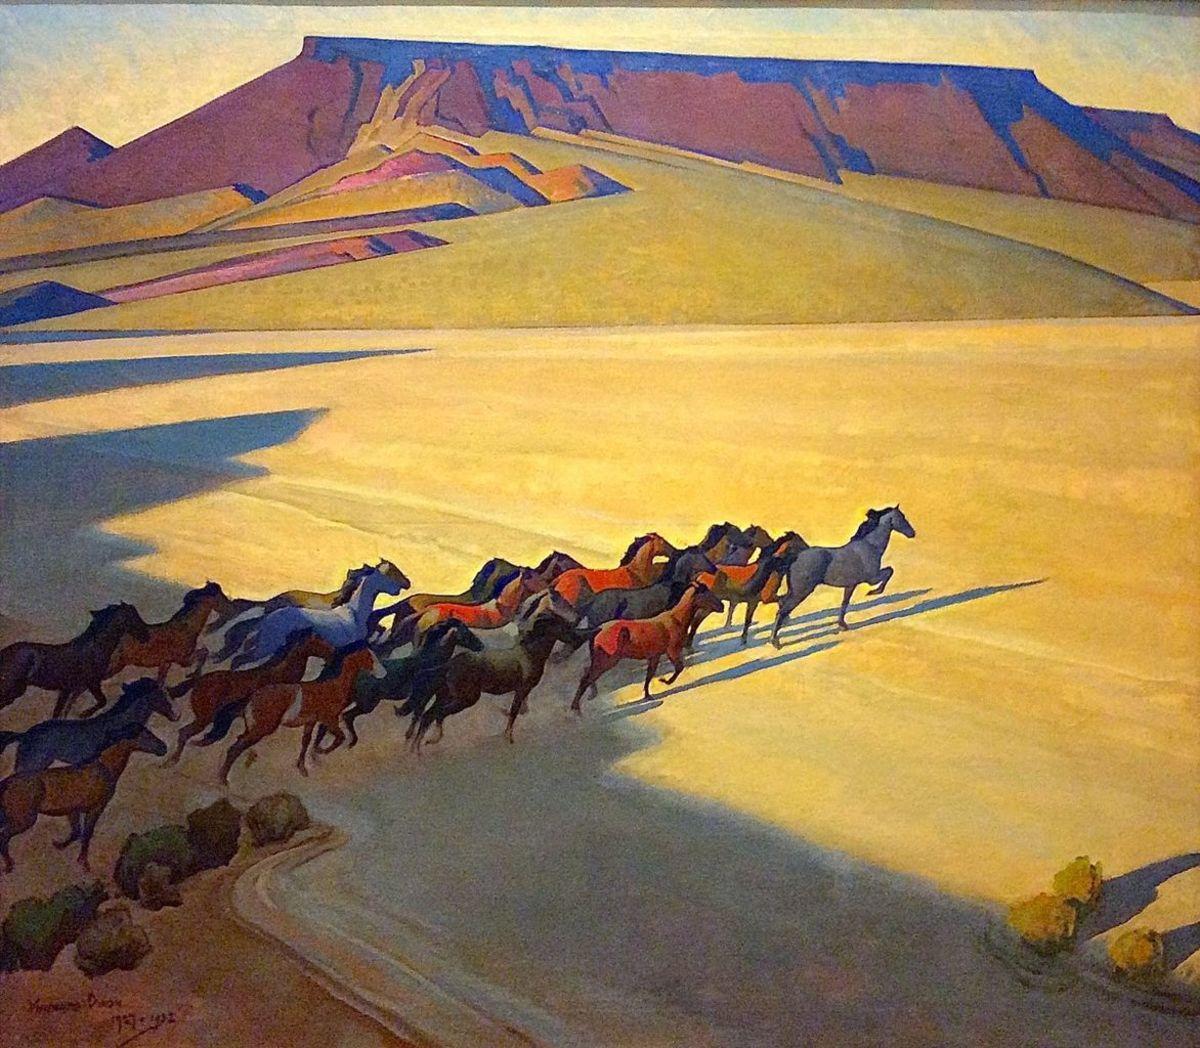 The Wild Horses of Nevada, a 1927 painting by Maynard Dixon